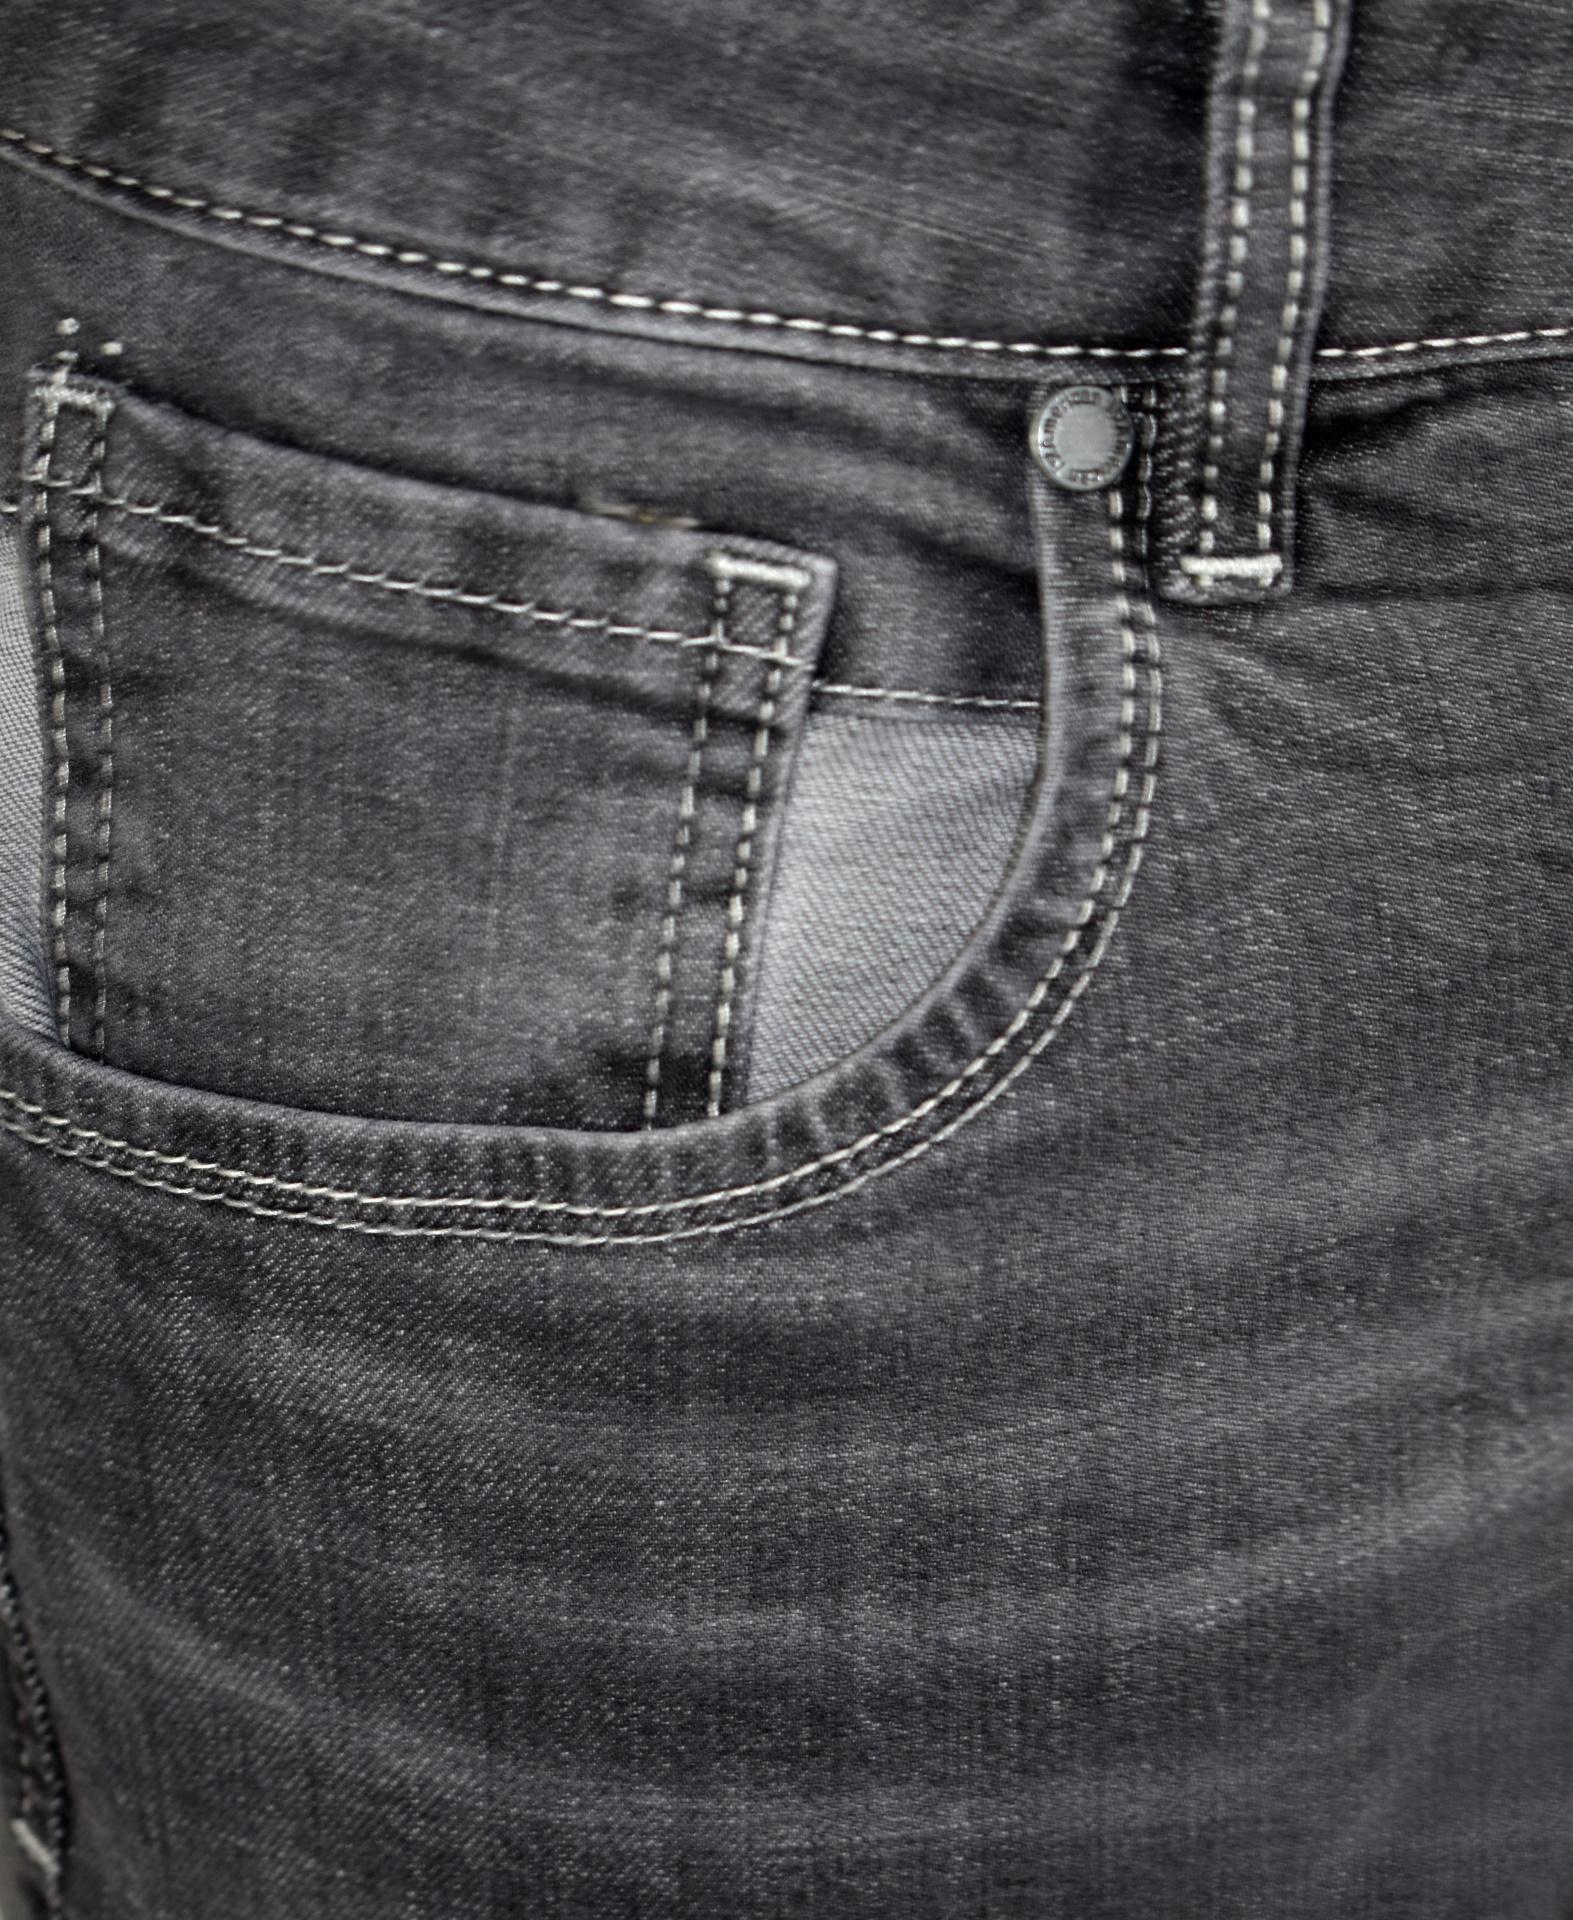 GREY JEANS UOMO 5 TASCHE GRIGIO CHIARO 2 1st american jeans fashion 5 tasche uomo colore grigio - 99% cotton 1% elastan denim 1150 oz